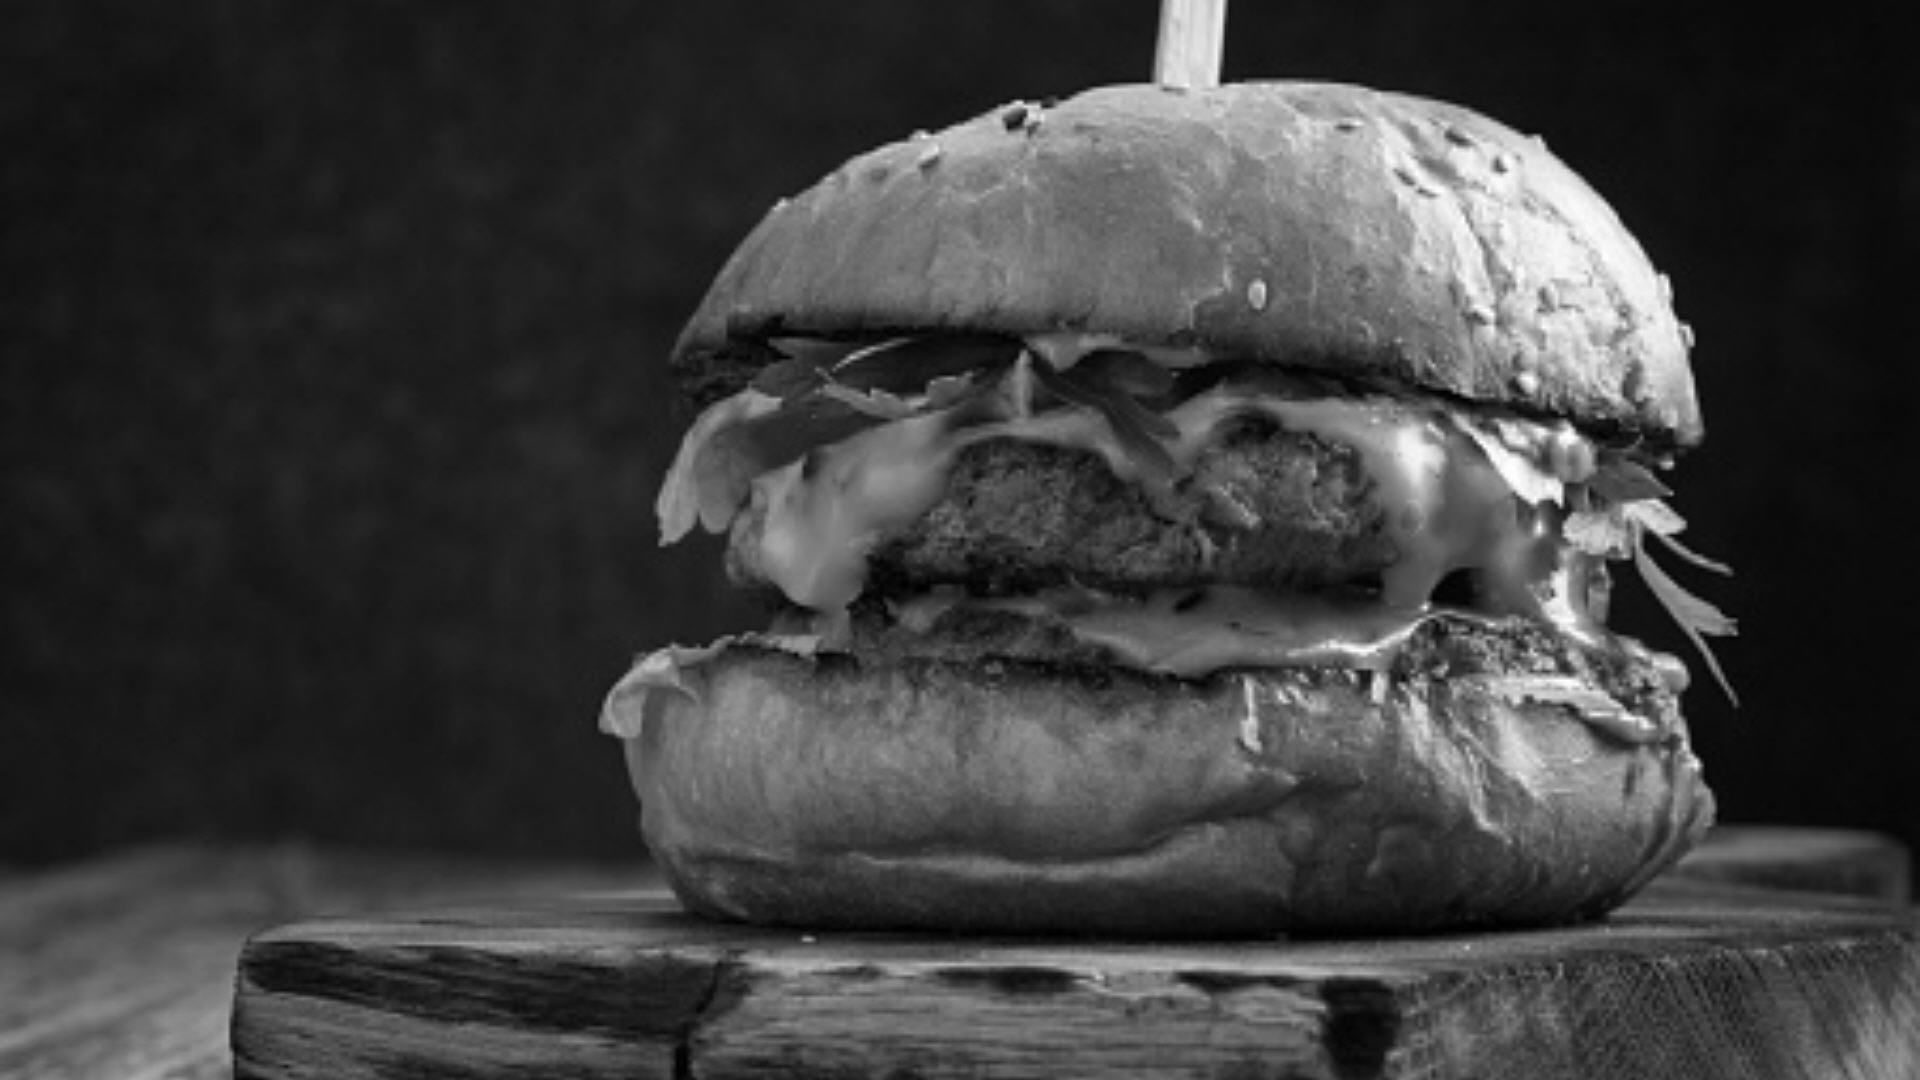 LOCKDOWN - CORONA Update | GRILLBAR fast.food